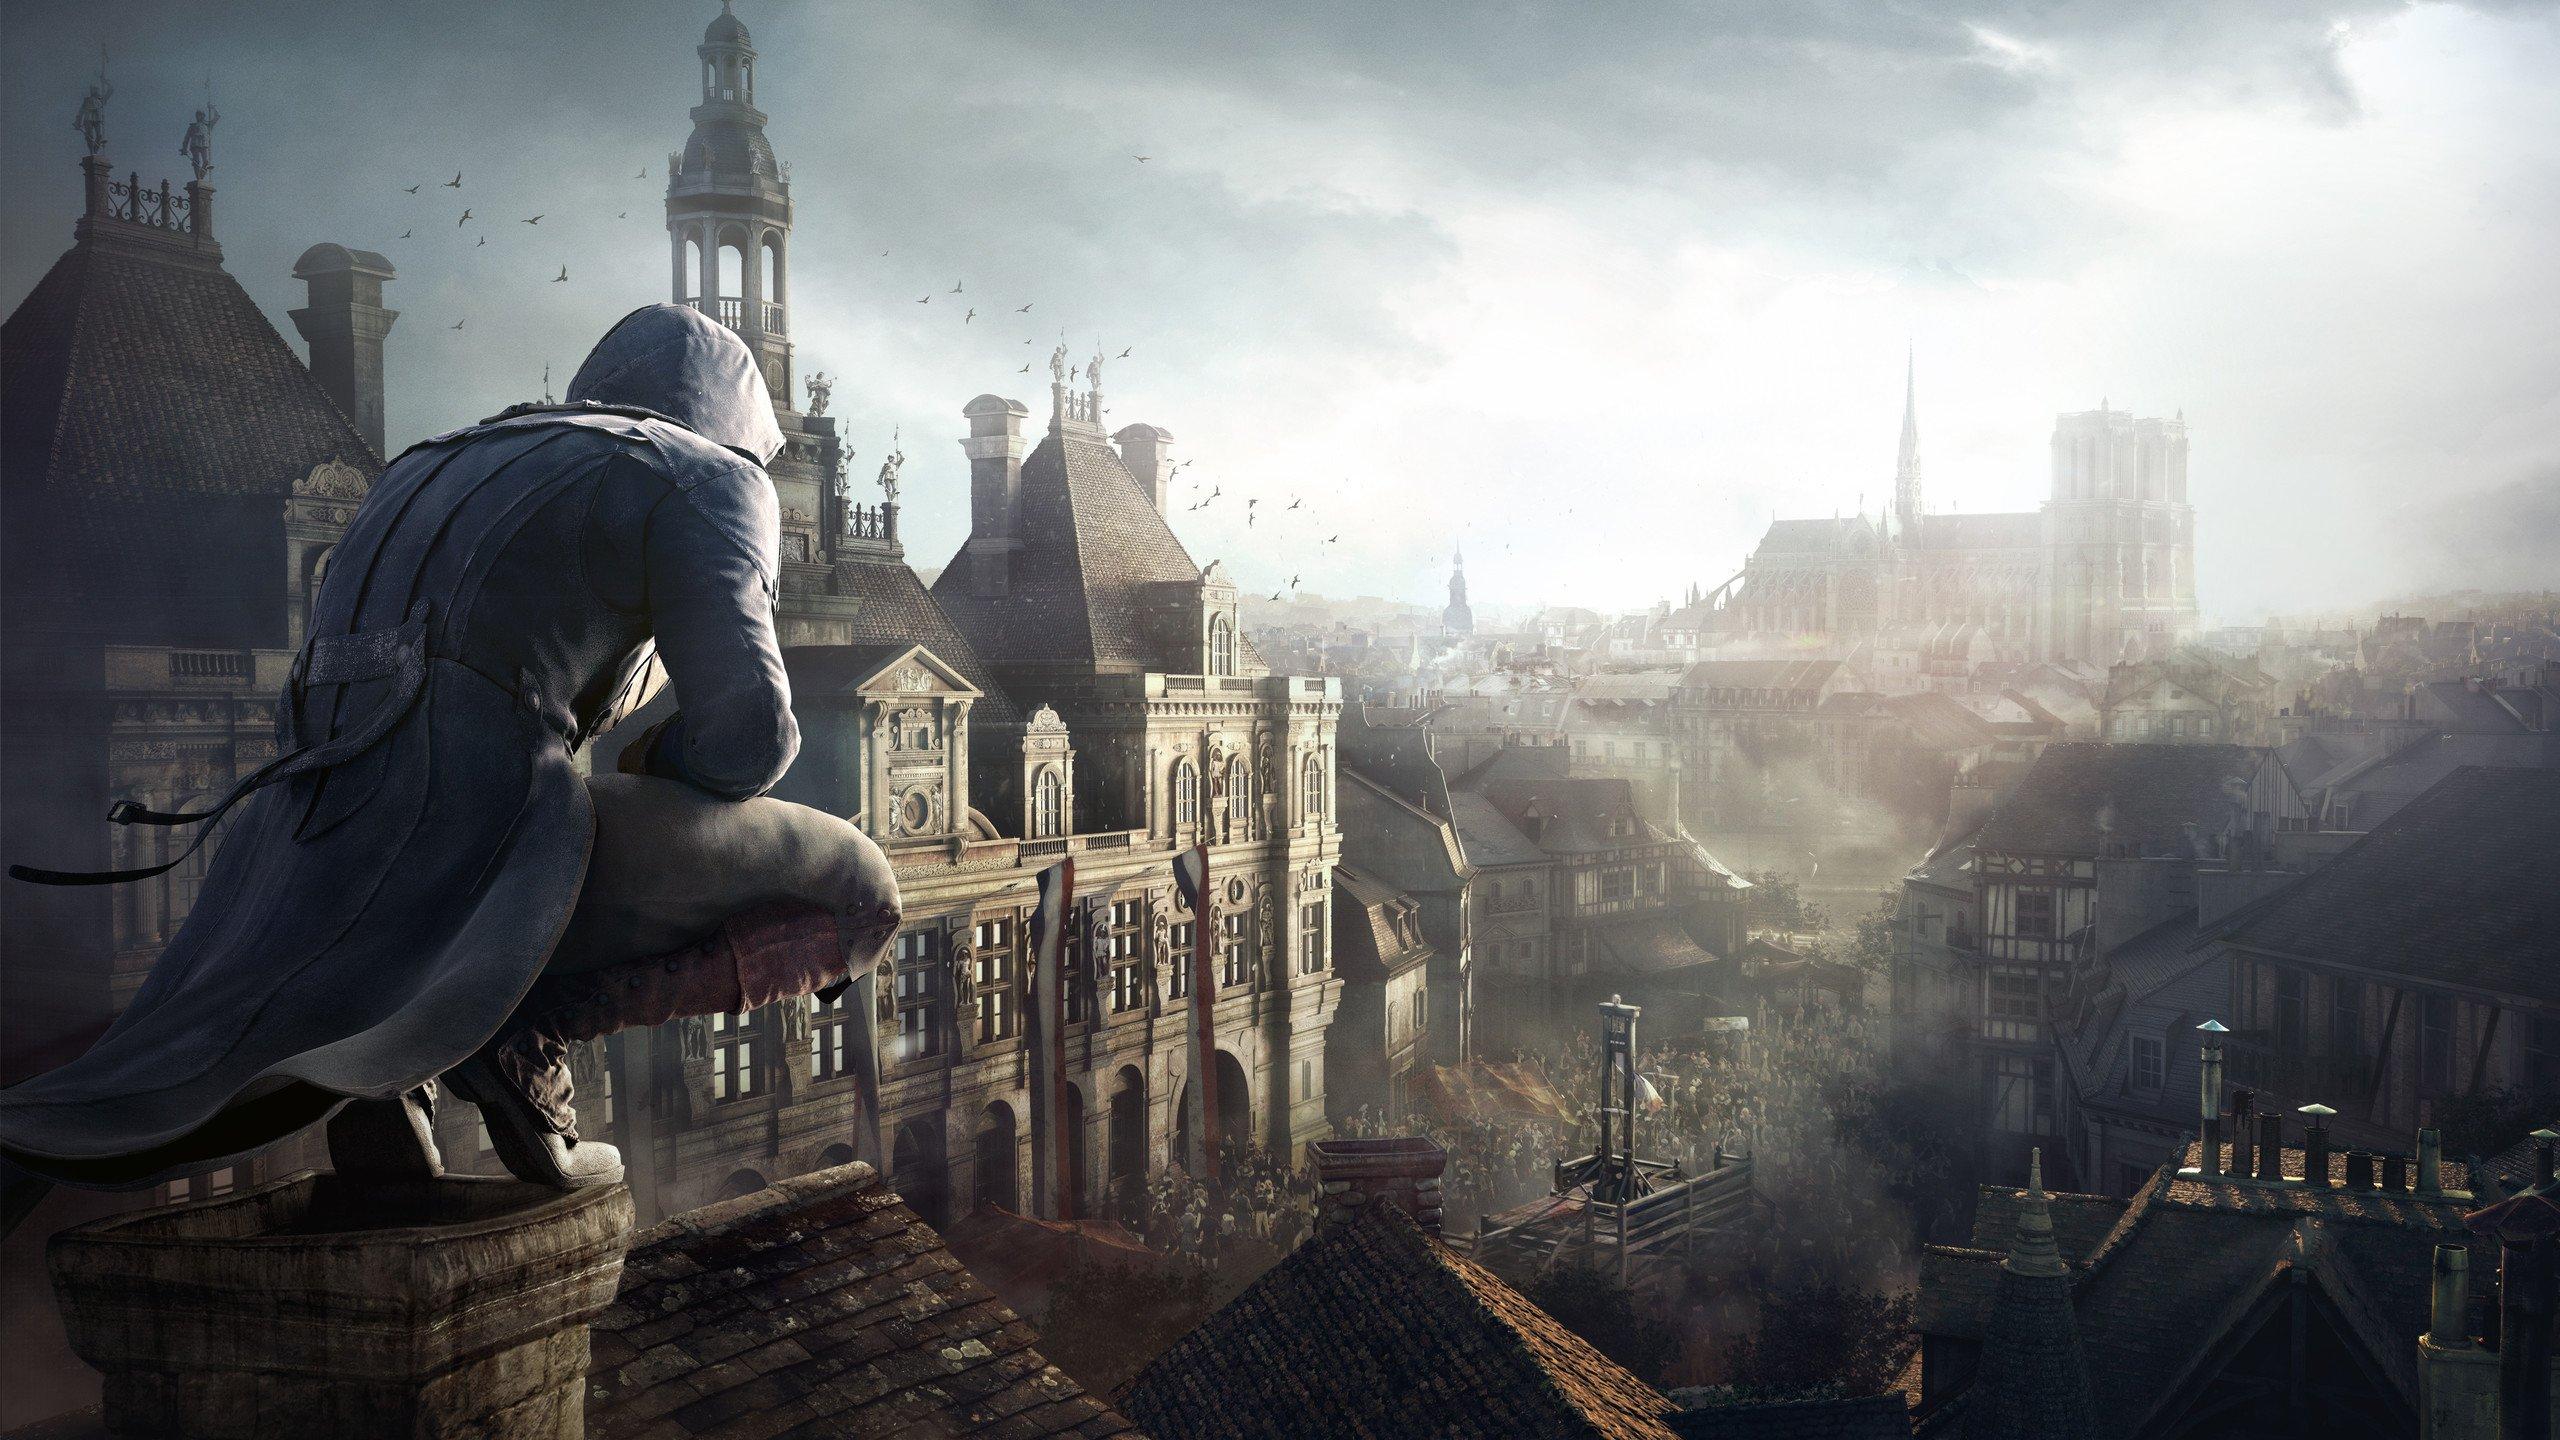 Assassins Creed: Unity 4K Duvar kağıdı